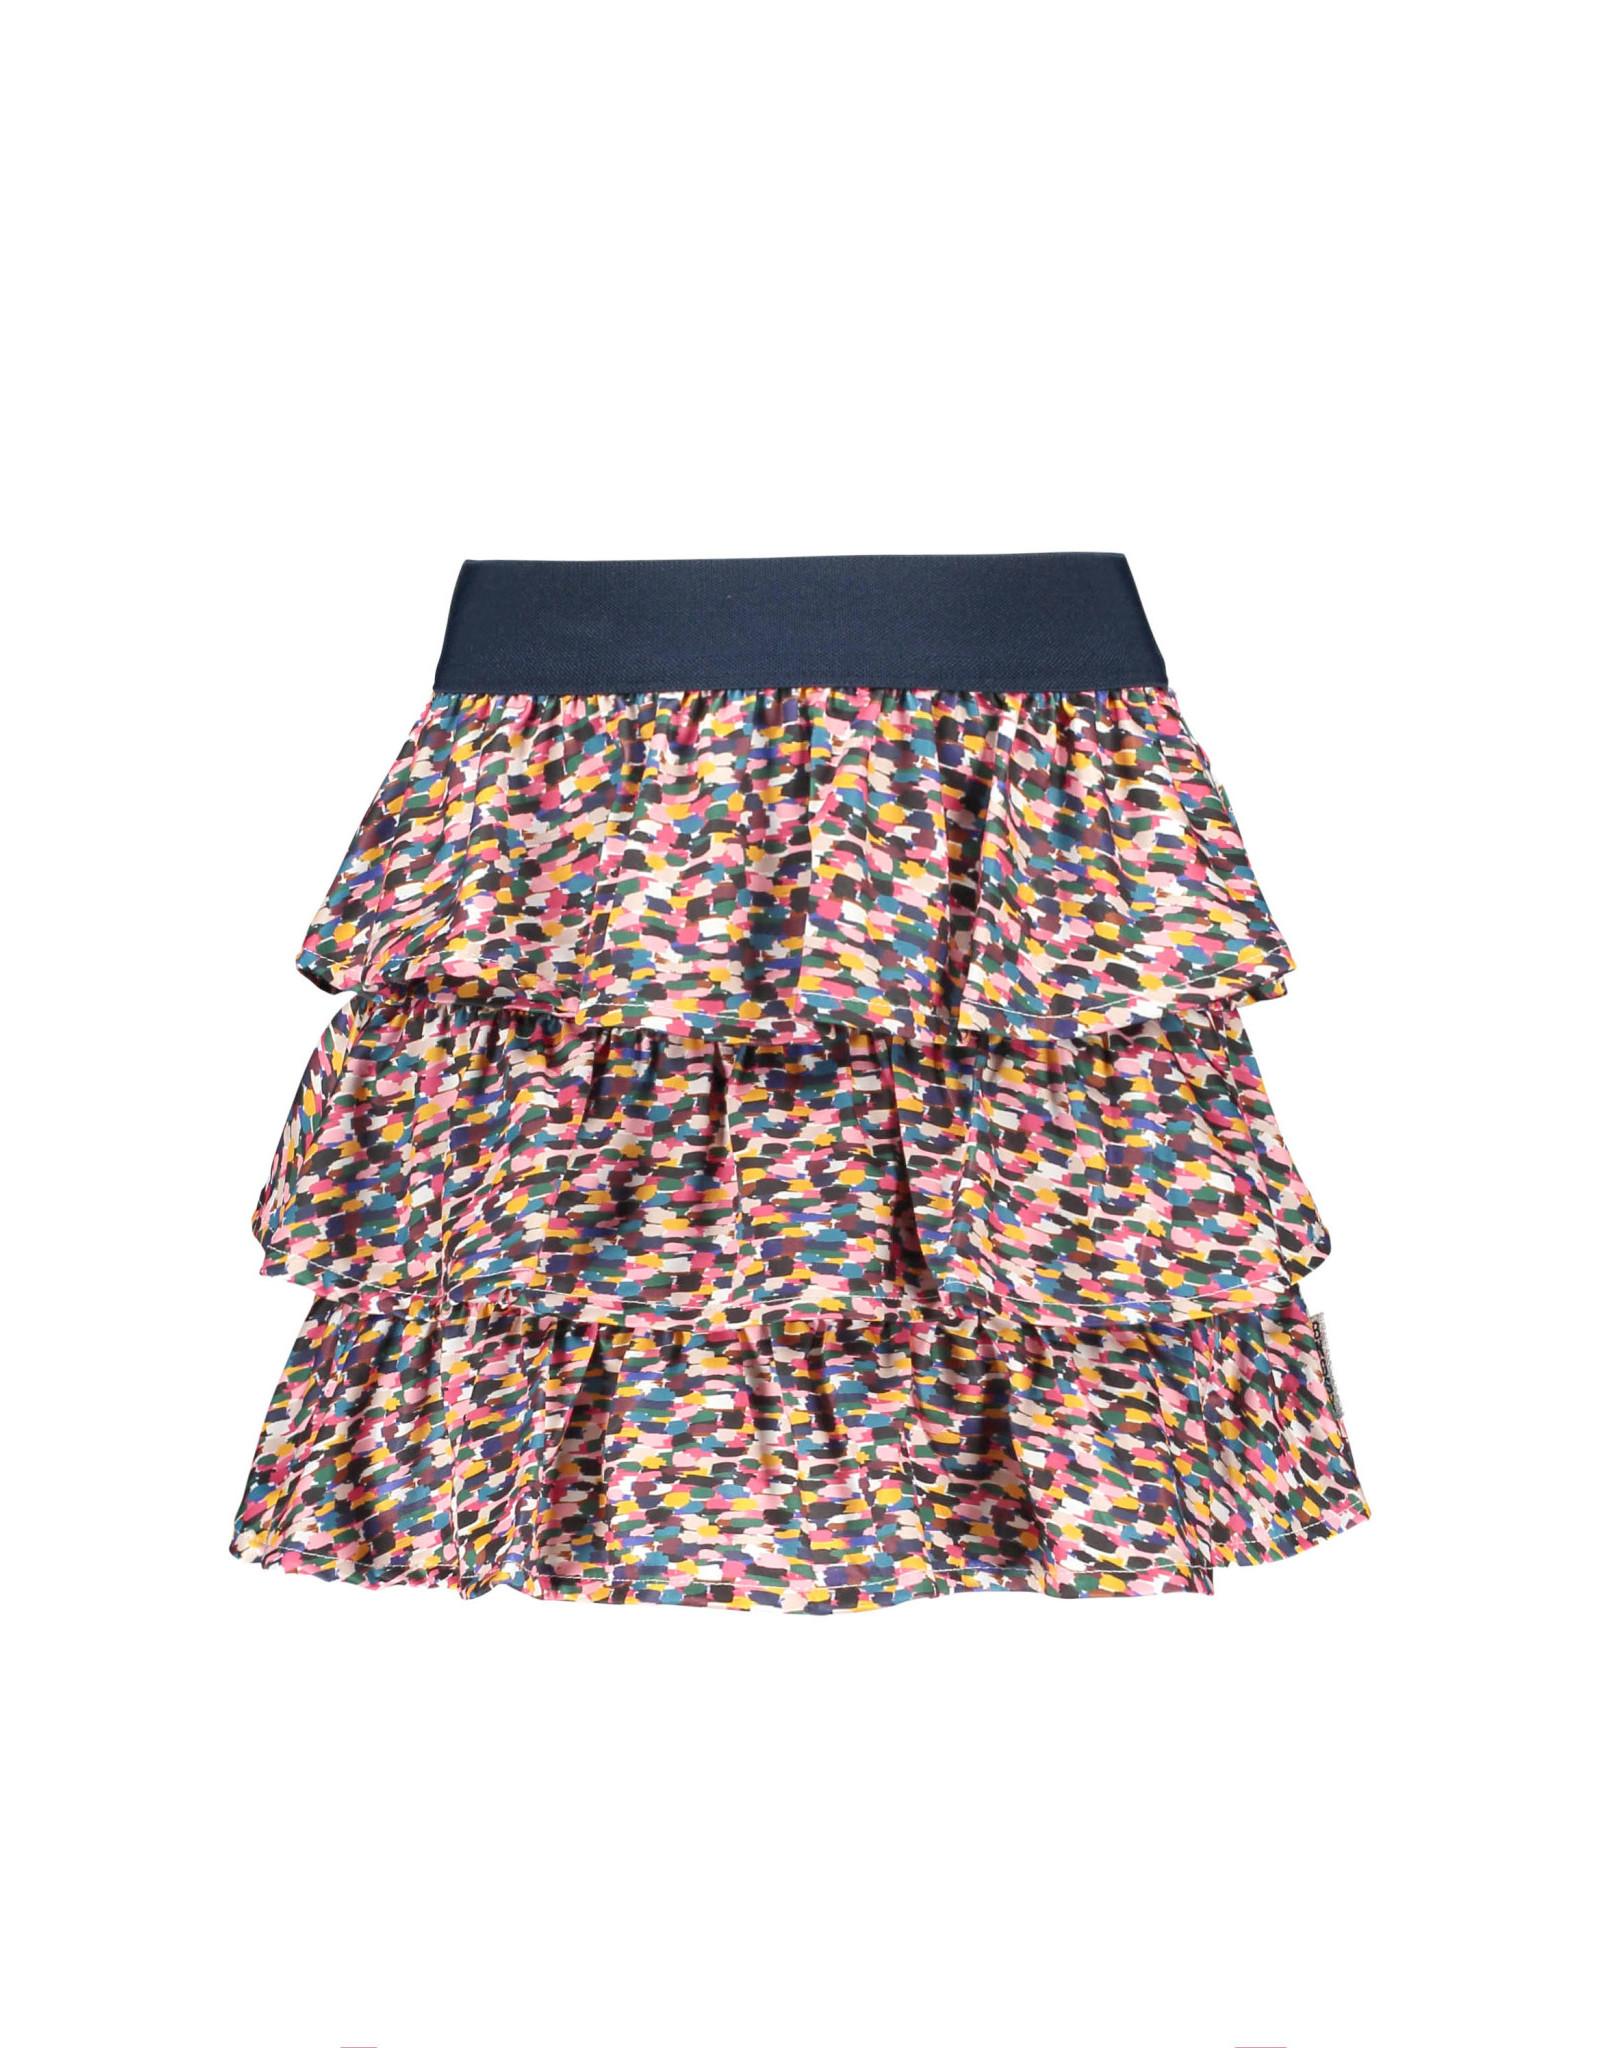 B-nosy Girls 3-layer sporty spickles skirt 970 Sporty spickles B.Sporty